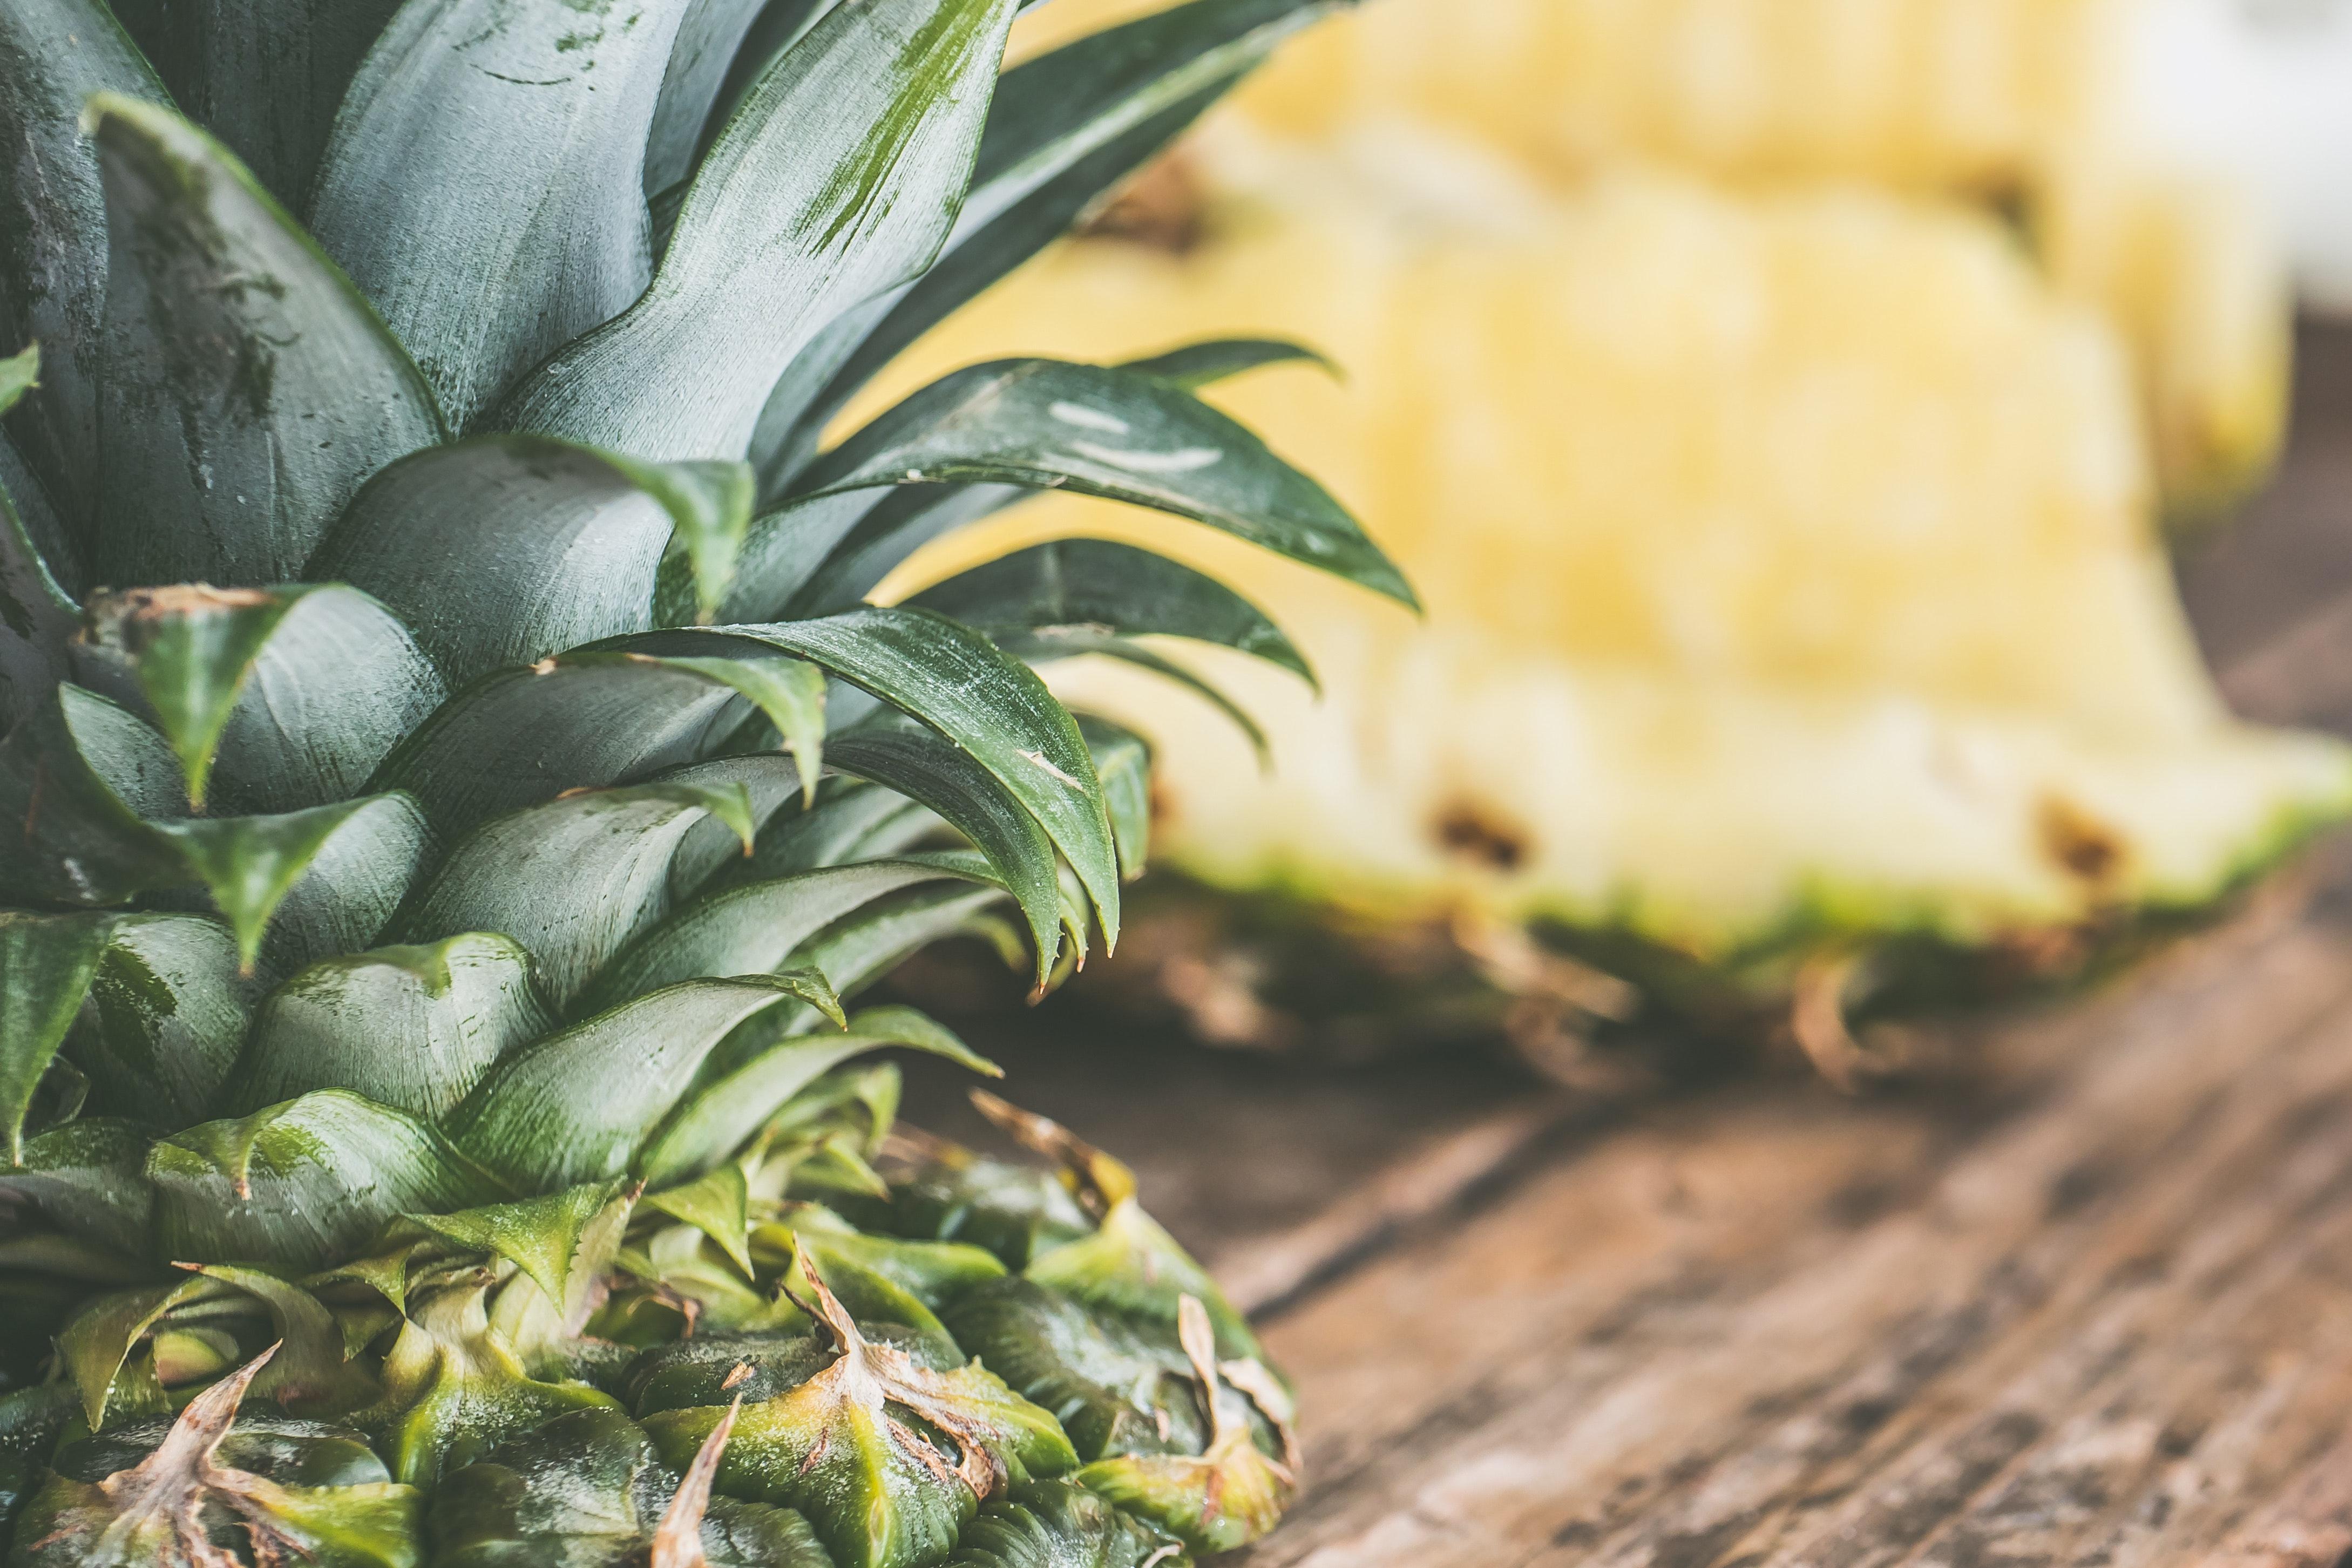 Sliced pineapple photo